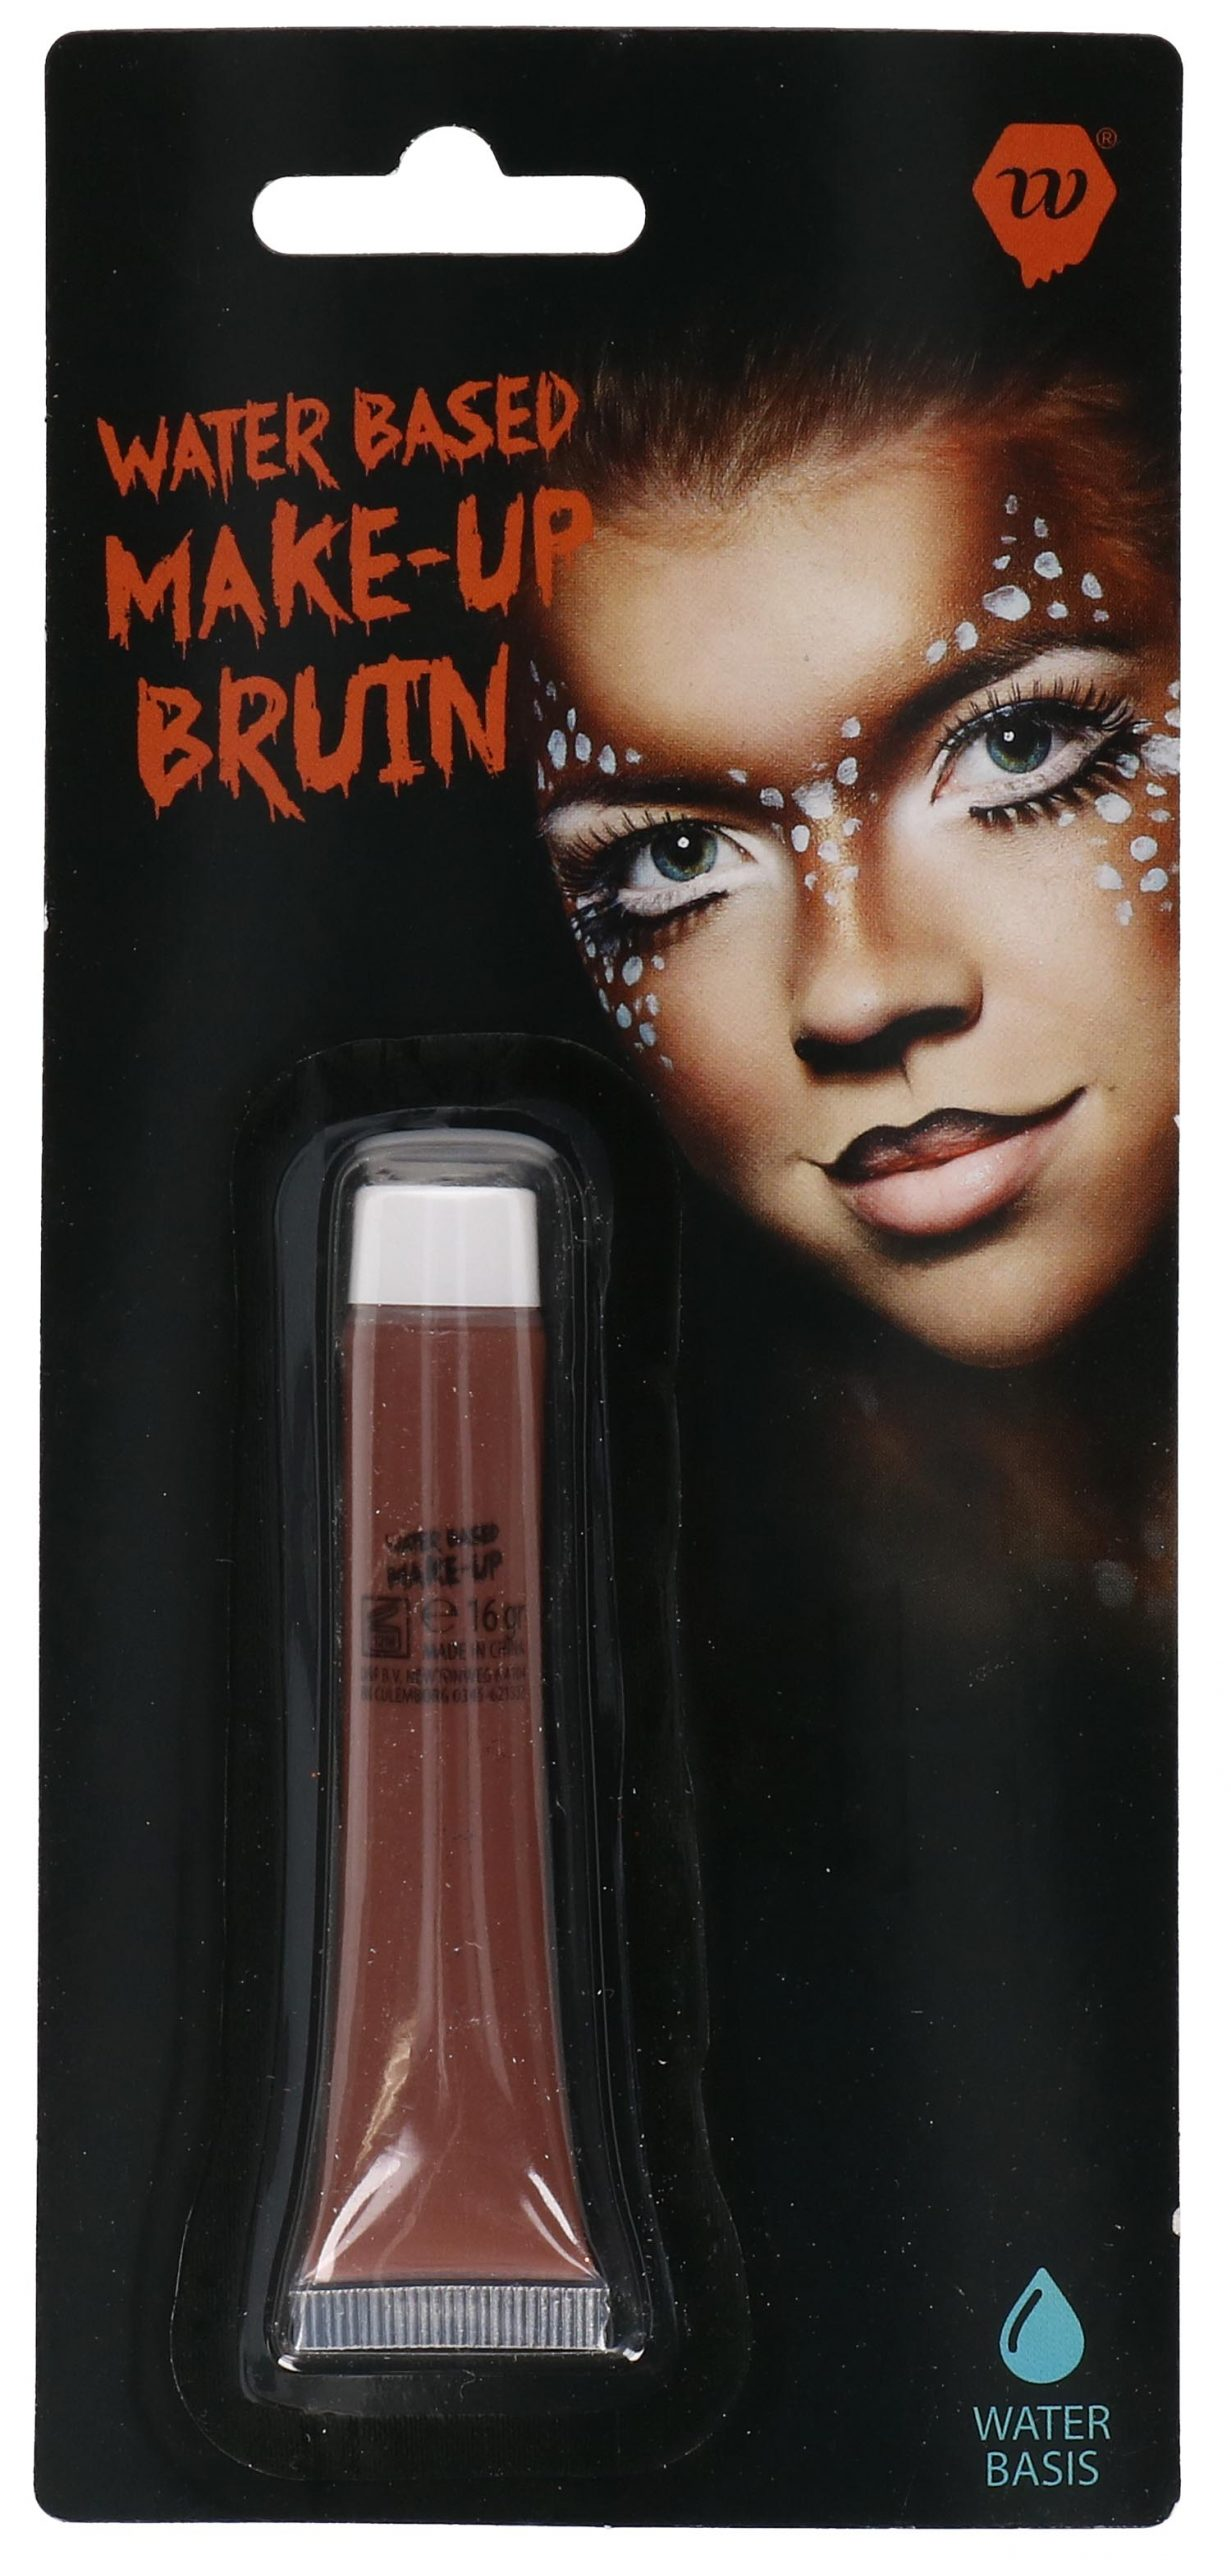 Water-Based Make-up Bruin Wauwfactor